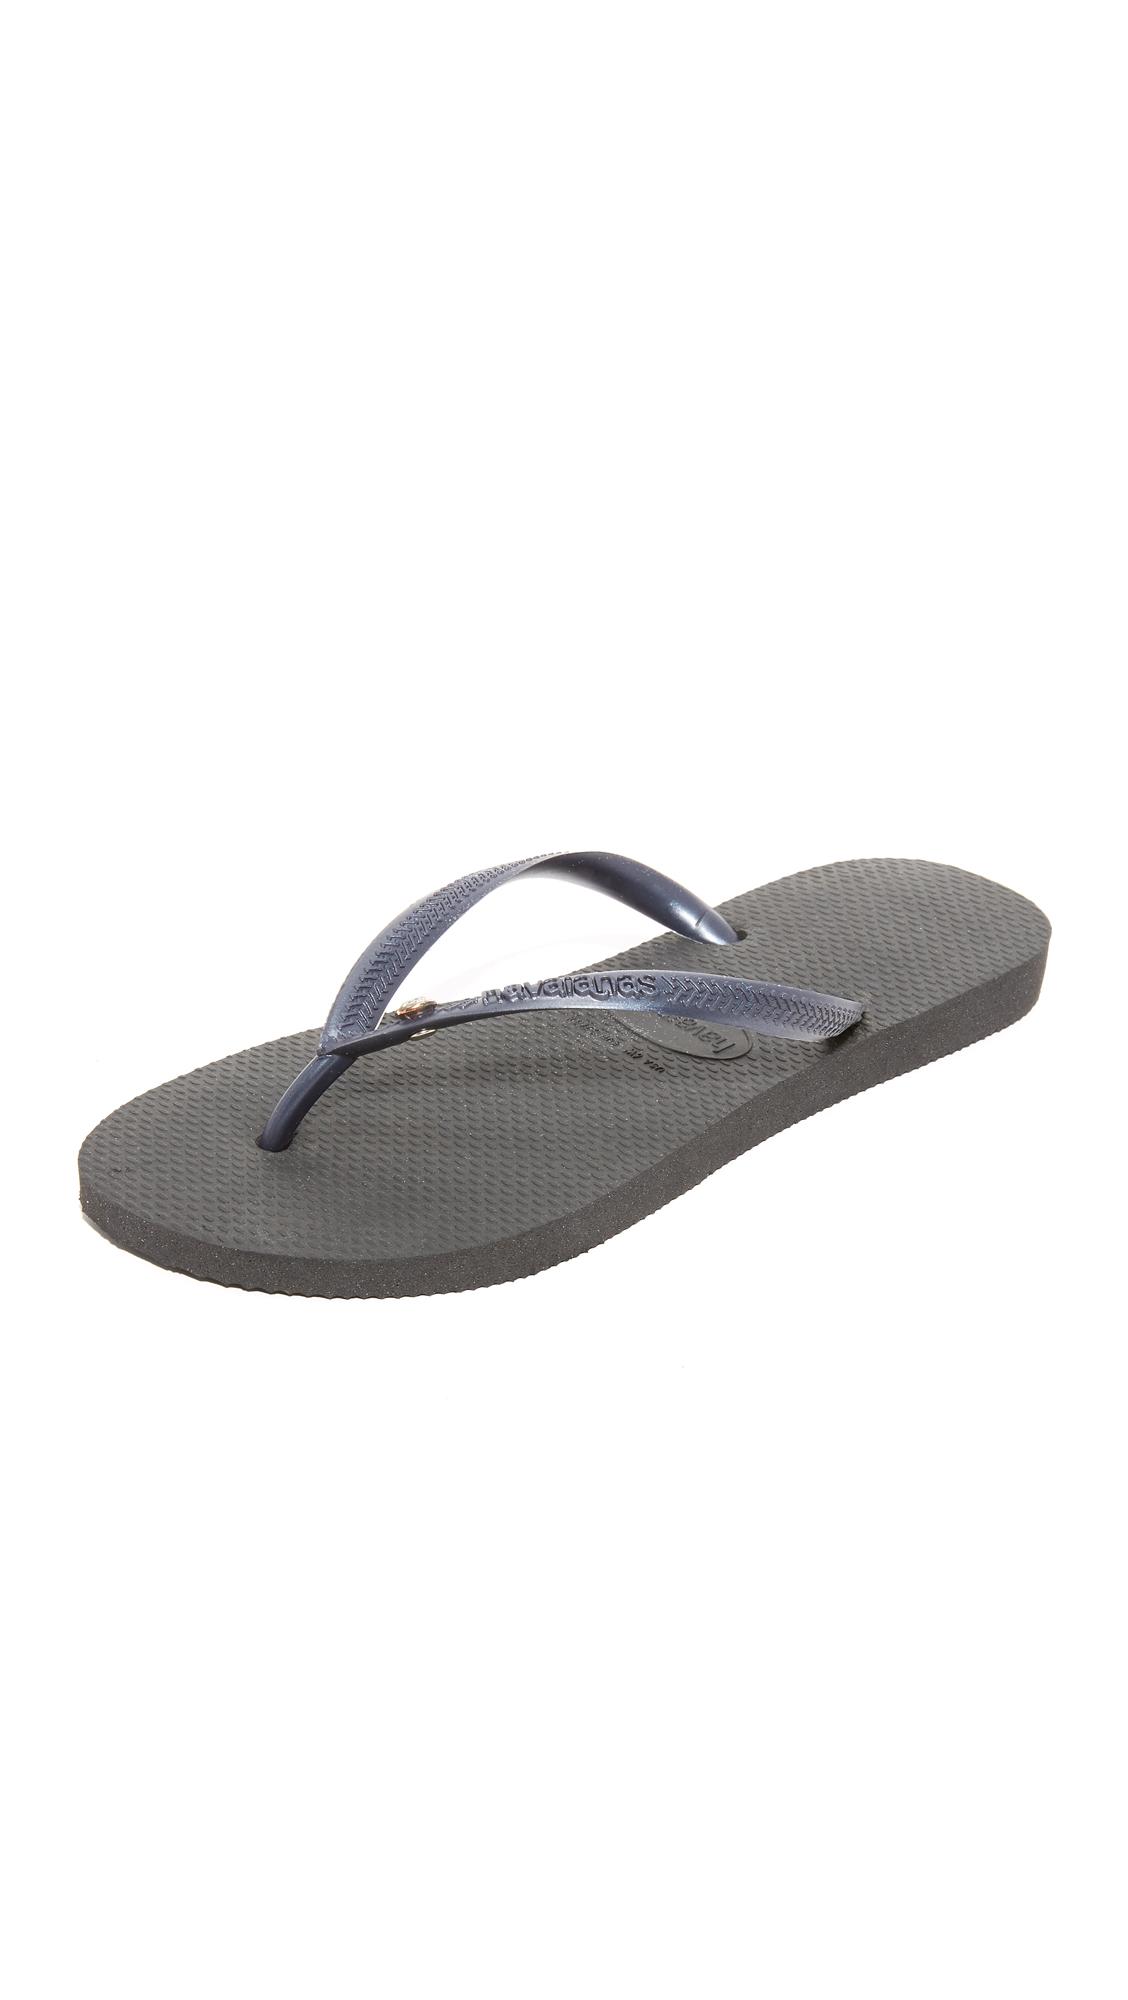 Havaianas Slim Crystal Glamour Flip Flops - Black at Shopbop